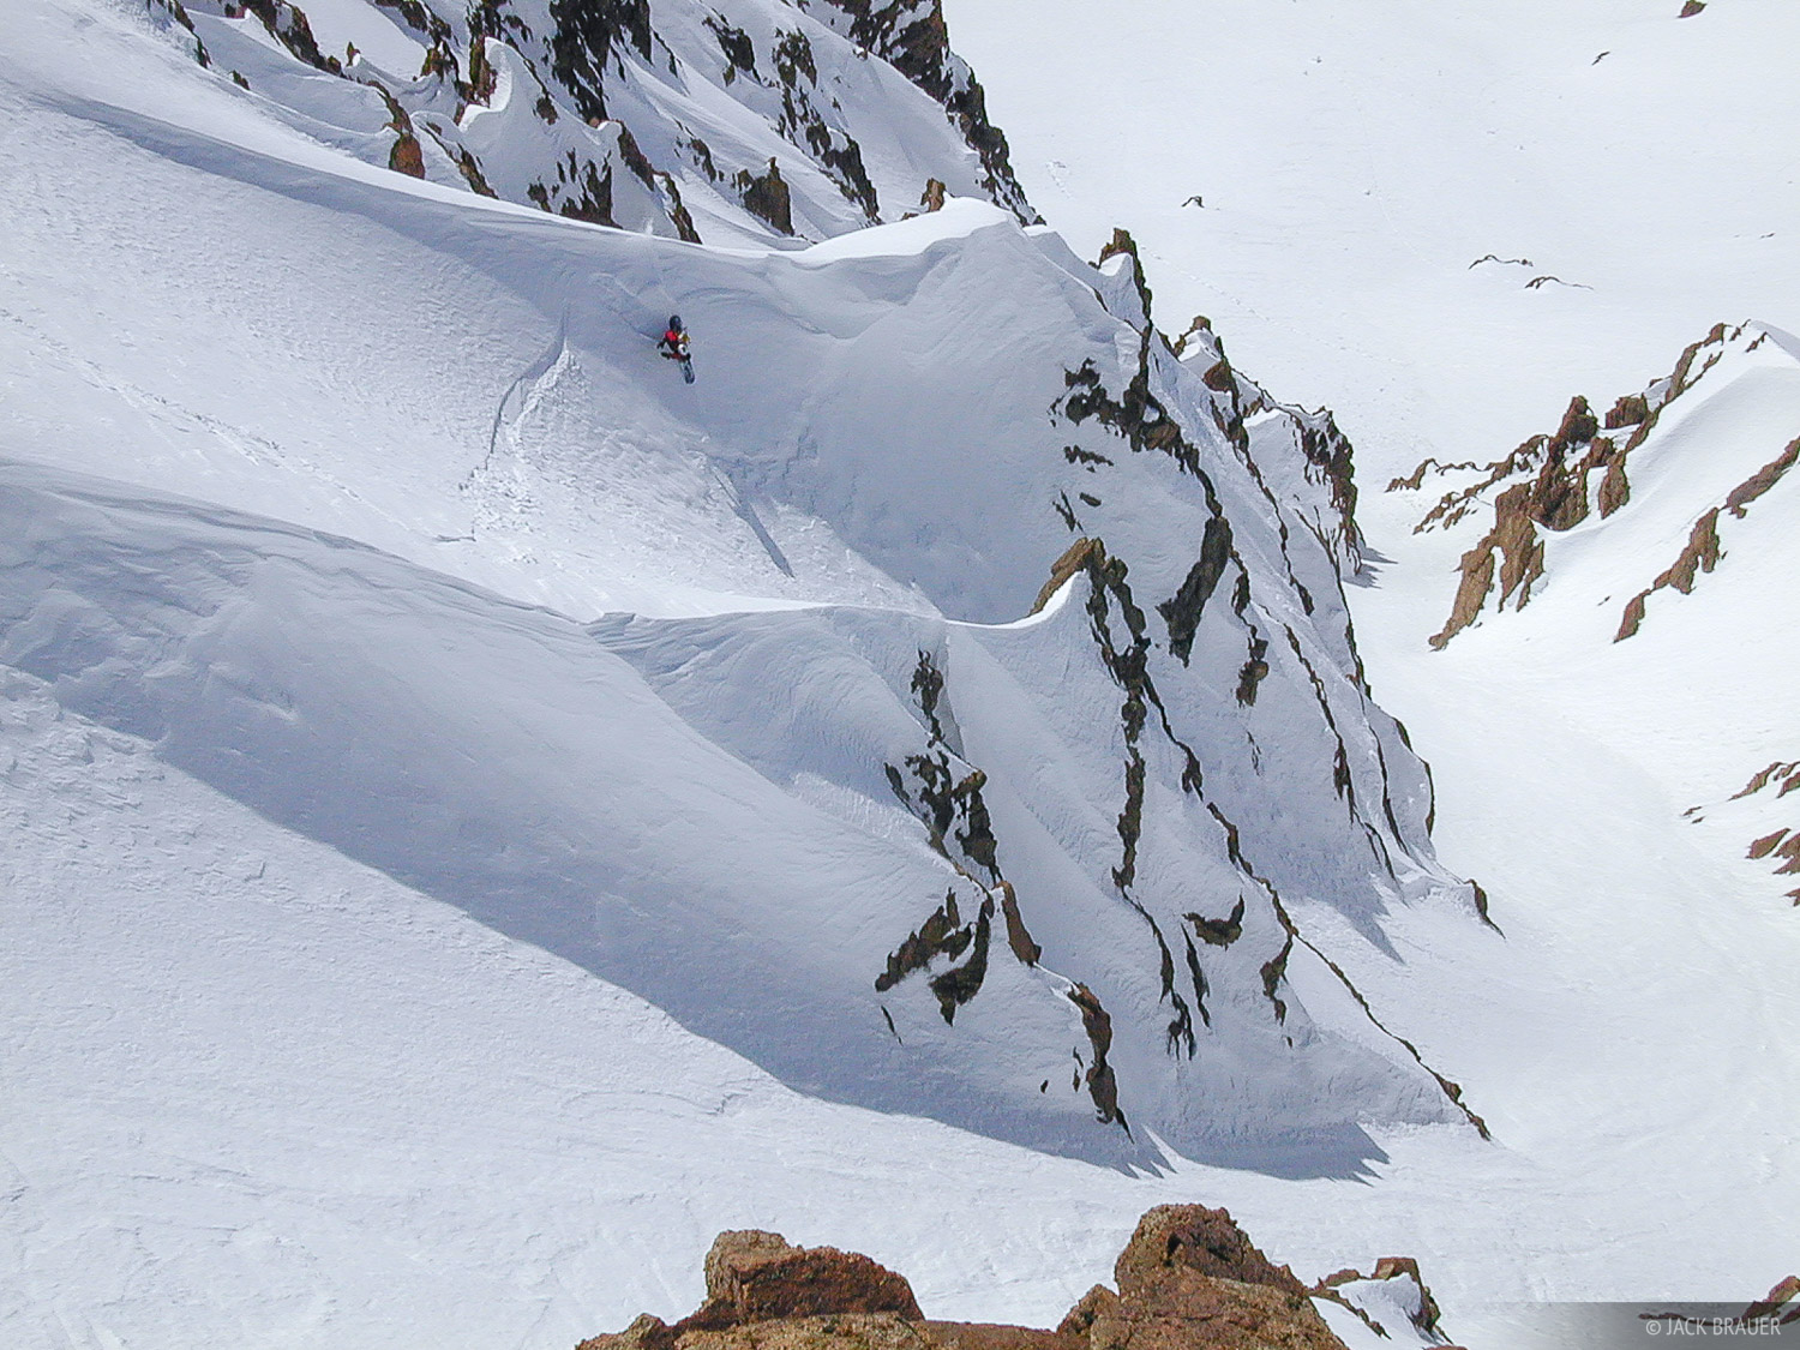 Sans Nome, couloir, Las Le, Las Leñas, Argentina, snowboarding, Las Leñas, photo